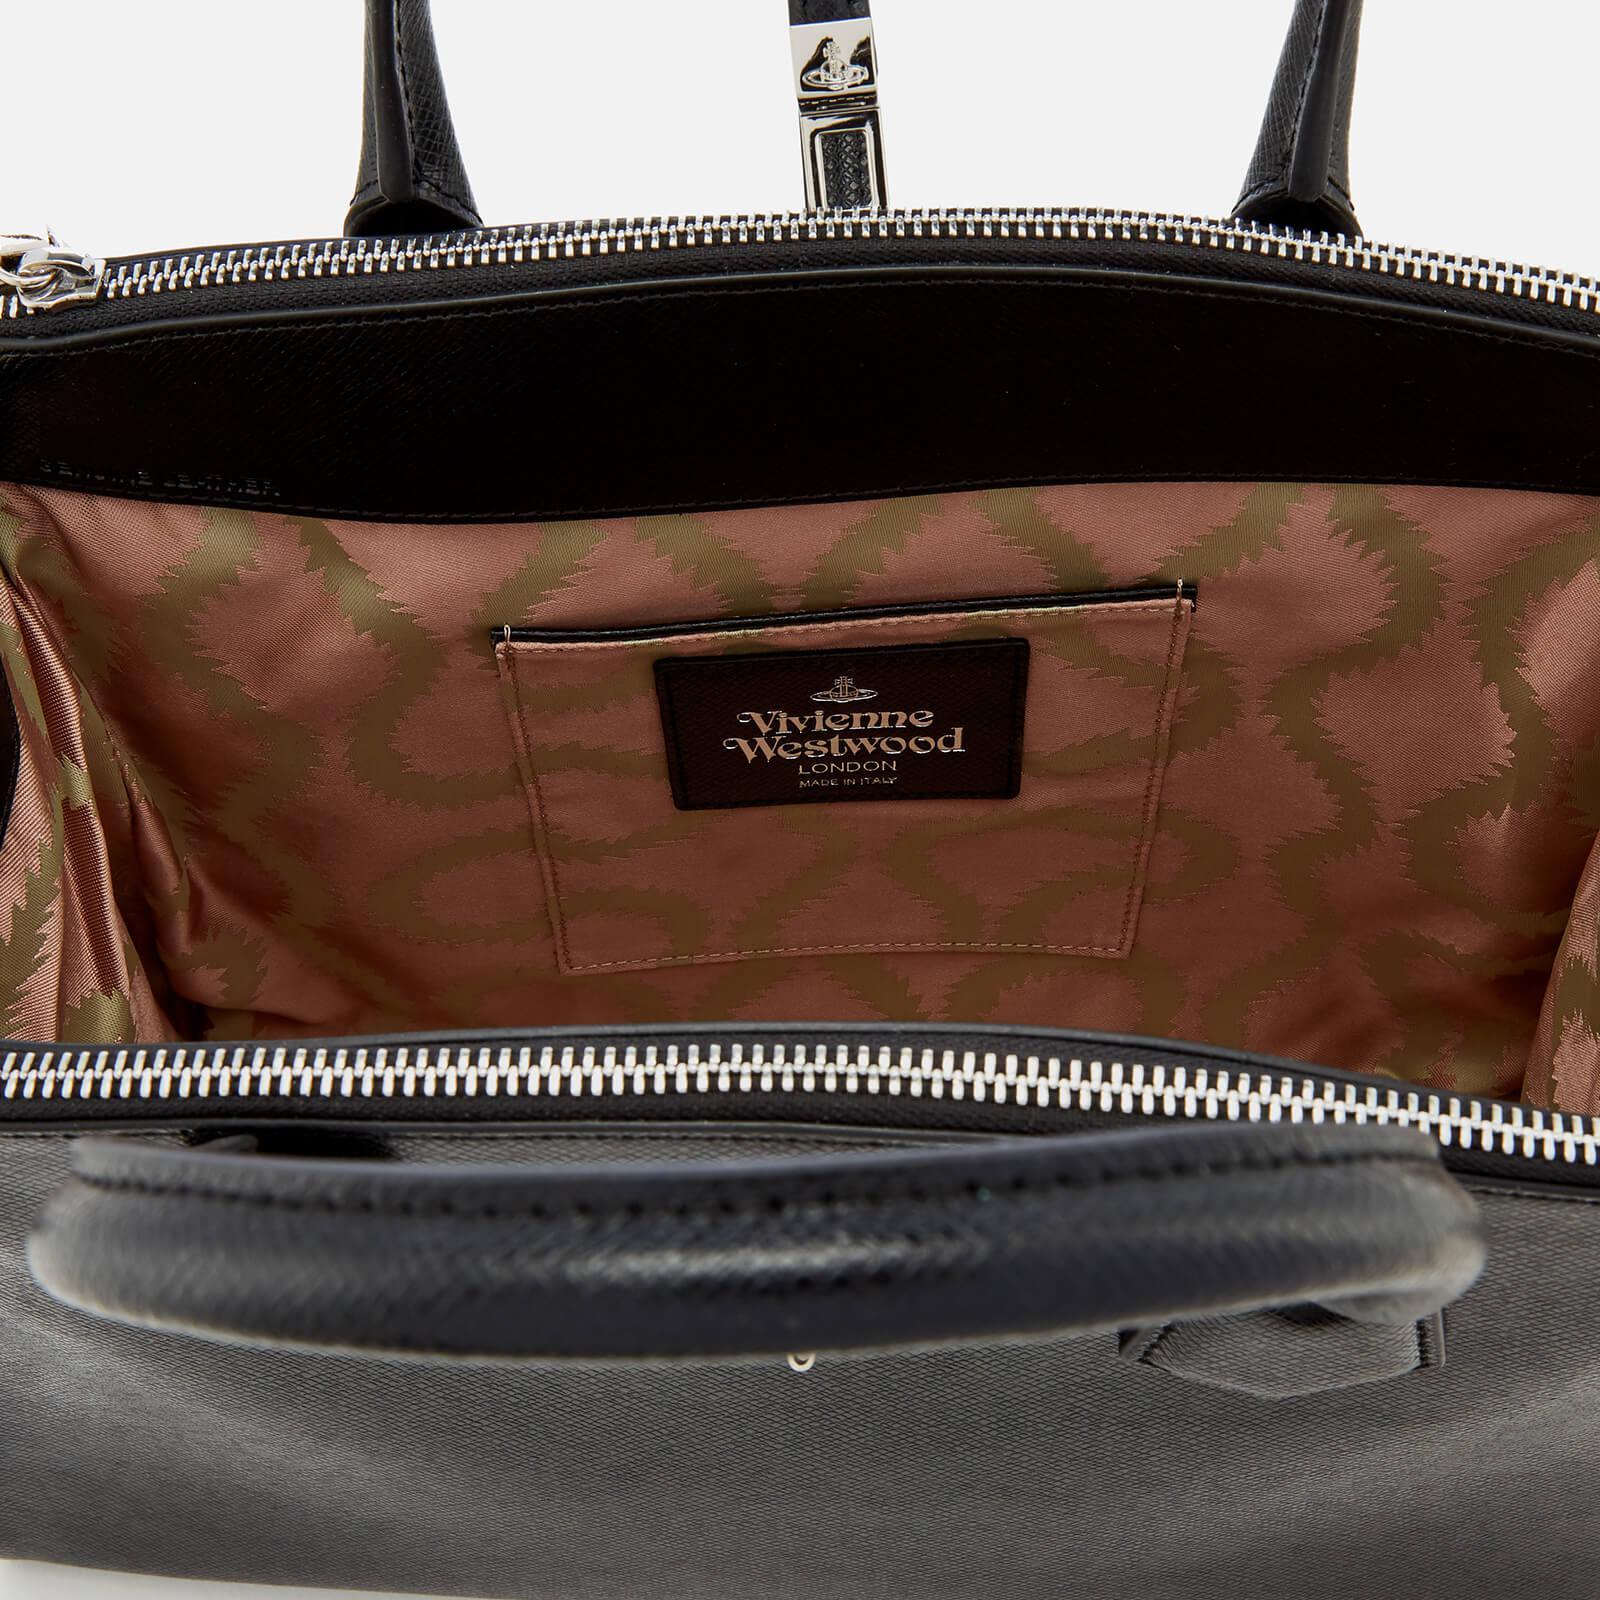 52ed254988 Vivienne Westwood Sofia Office Bag in Black - Lyst